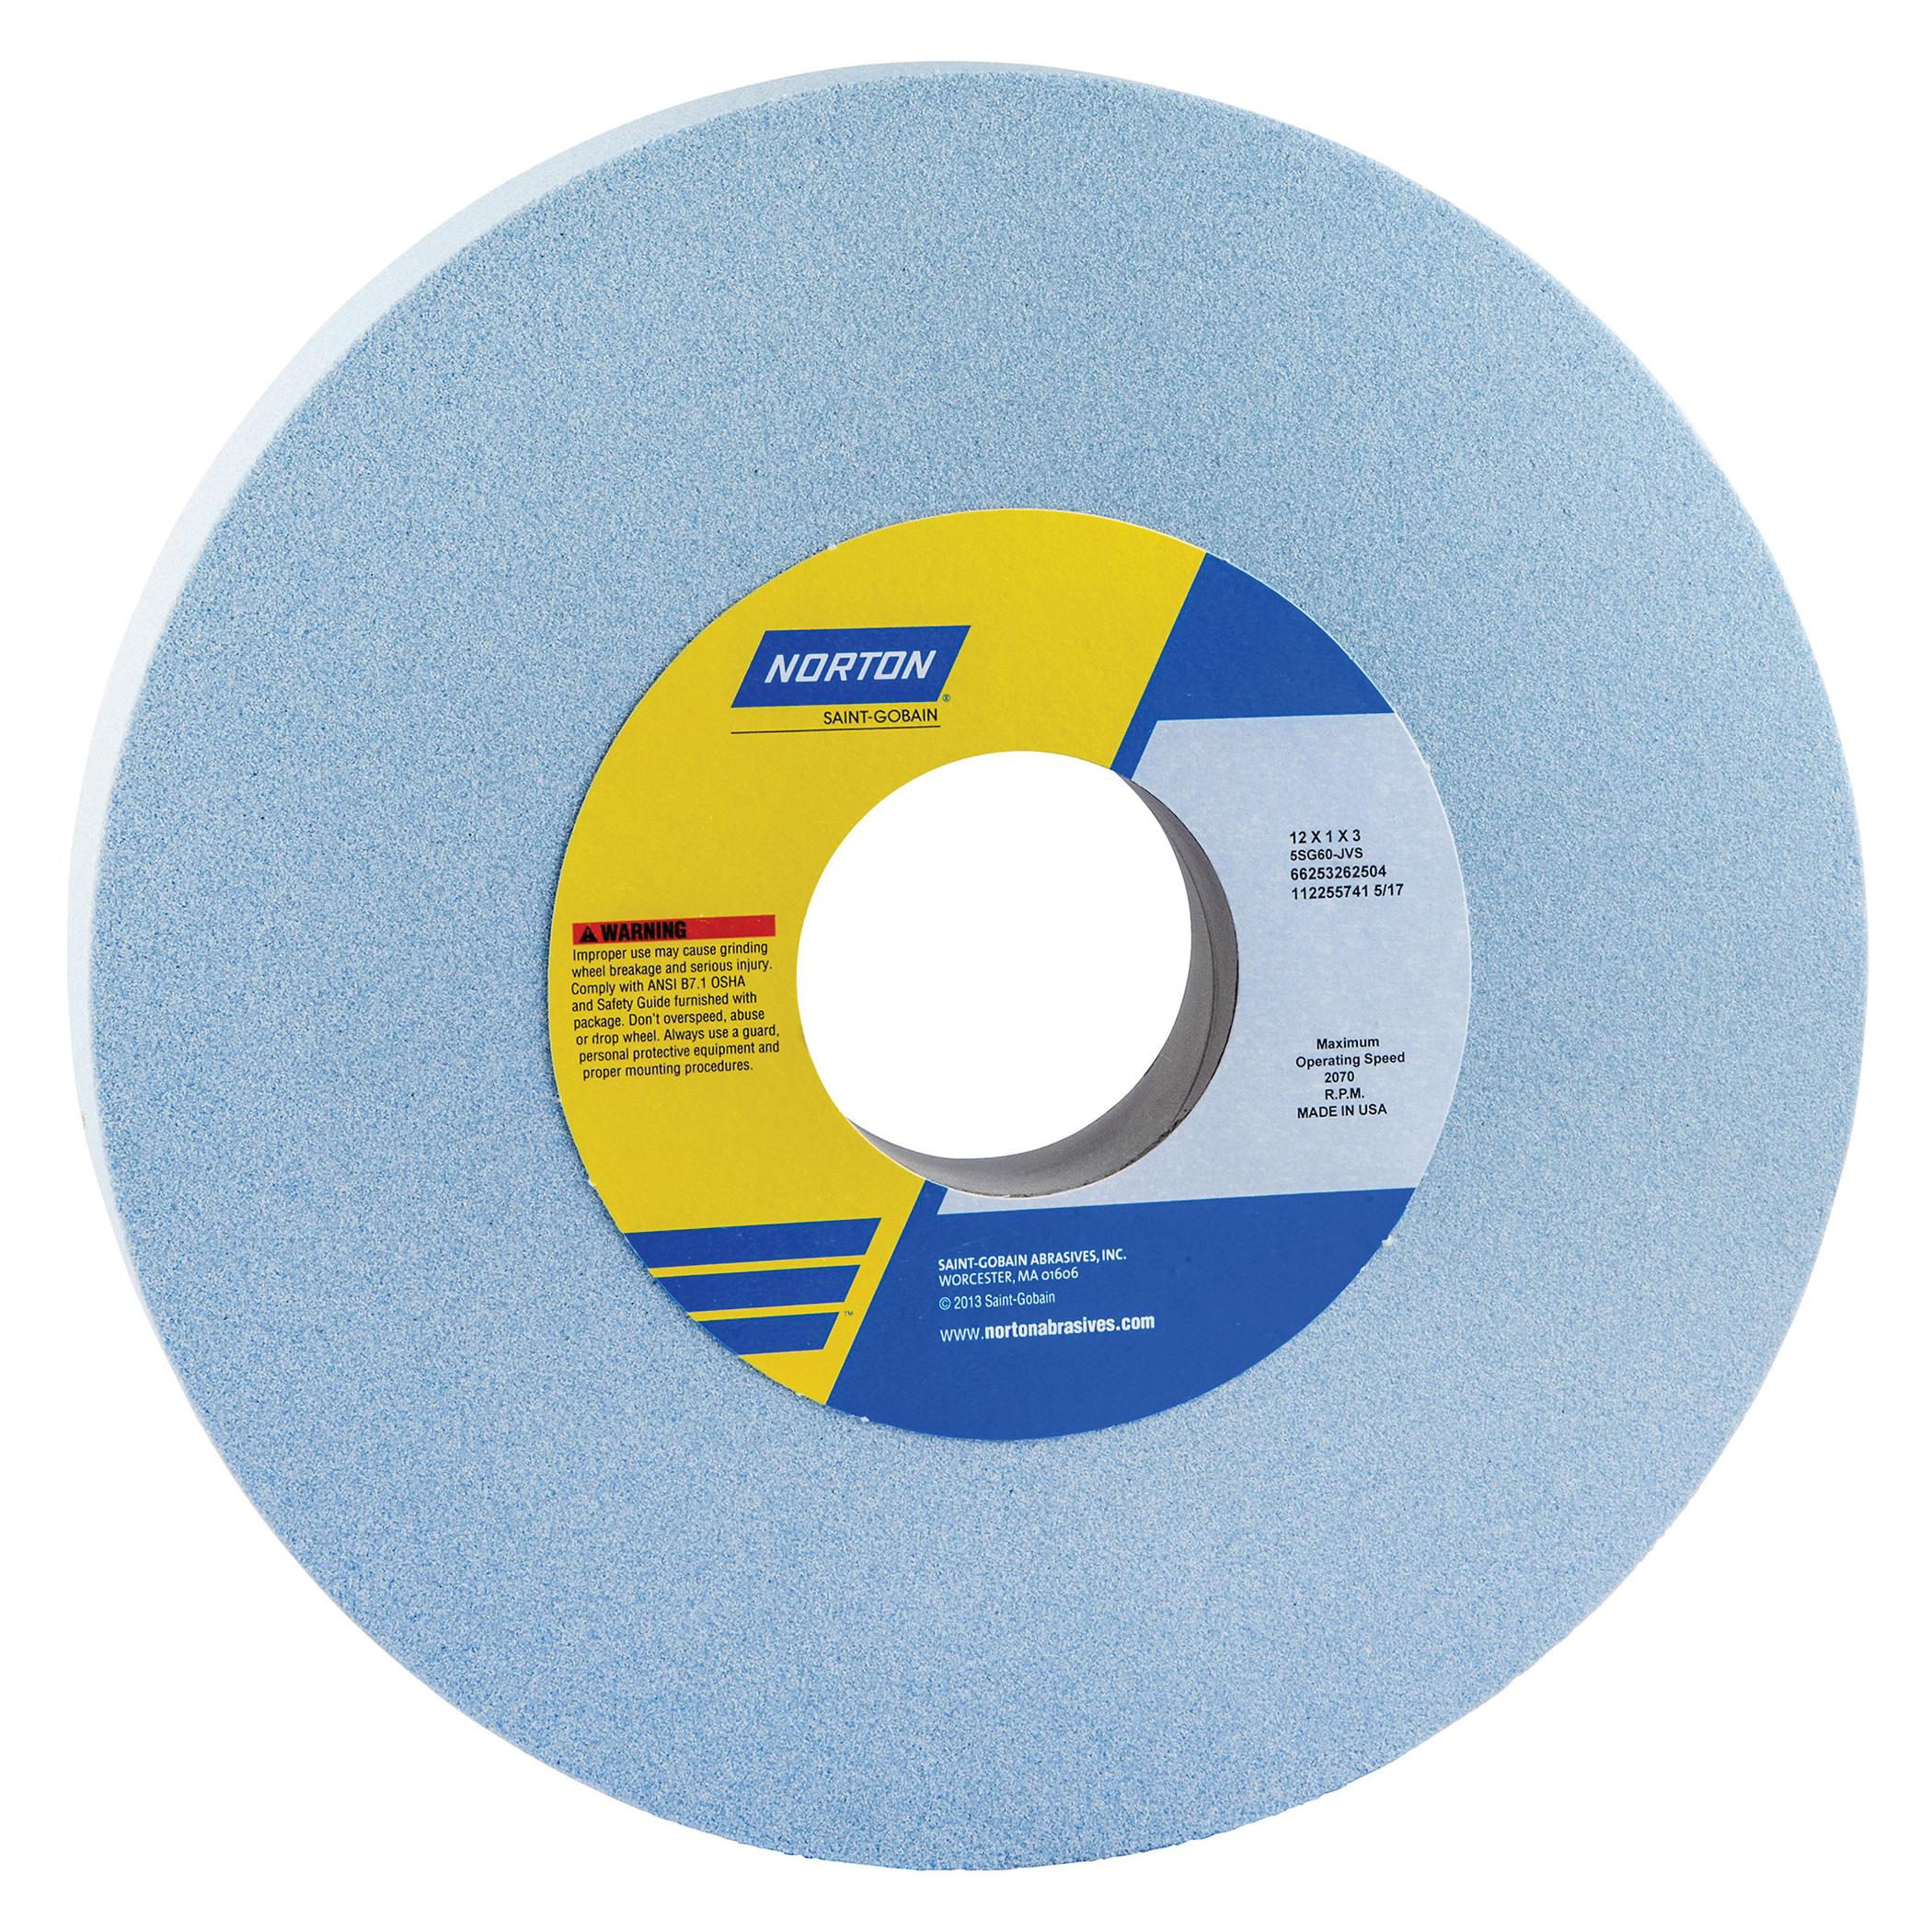 Norton® 66253262500 5SG Straight Toolroom Wheel, 12 in Dia x 1 in THK, 3 in Center Hole, 46 Grit, Ceramic Alumina/Friable Aluminum Oxide Abrasive